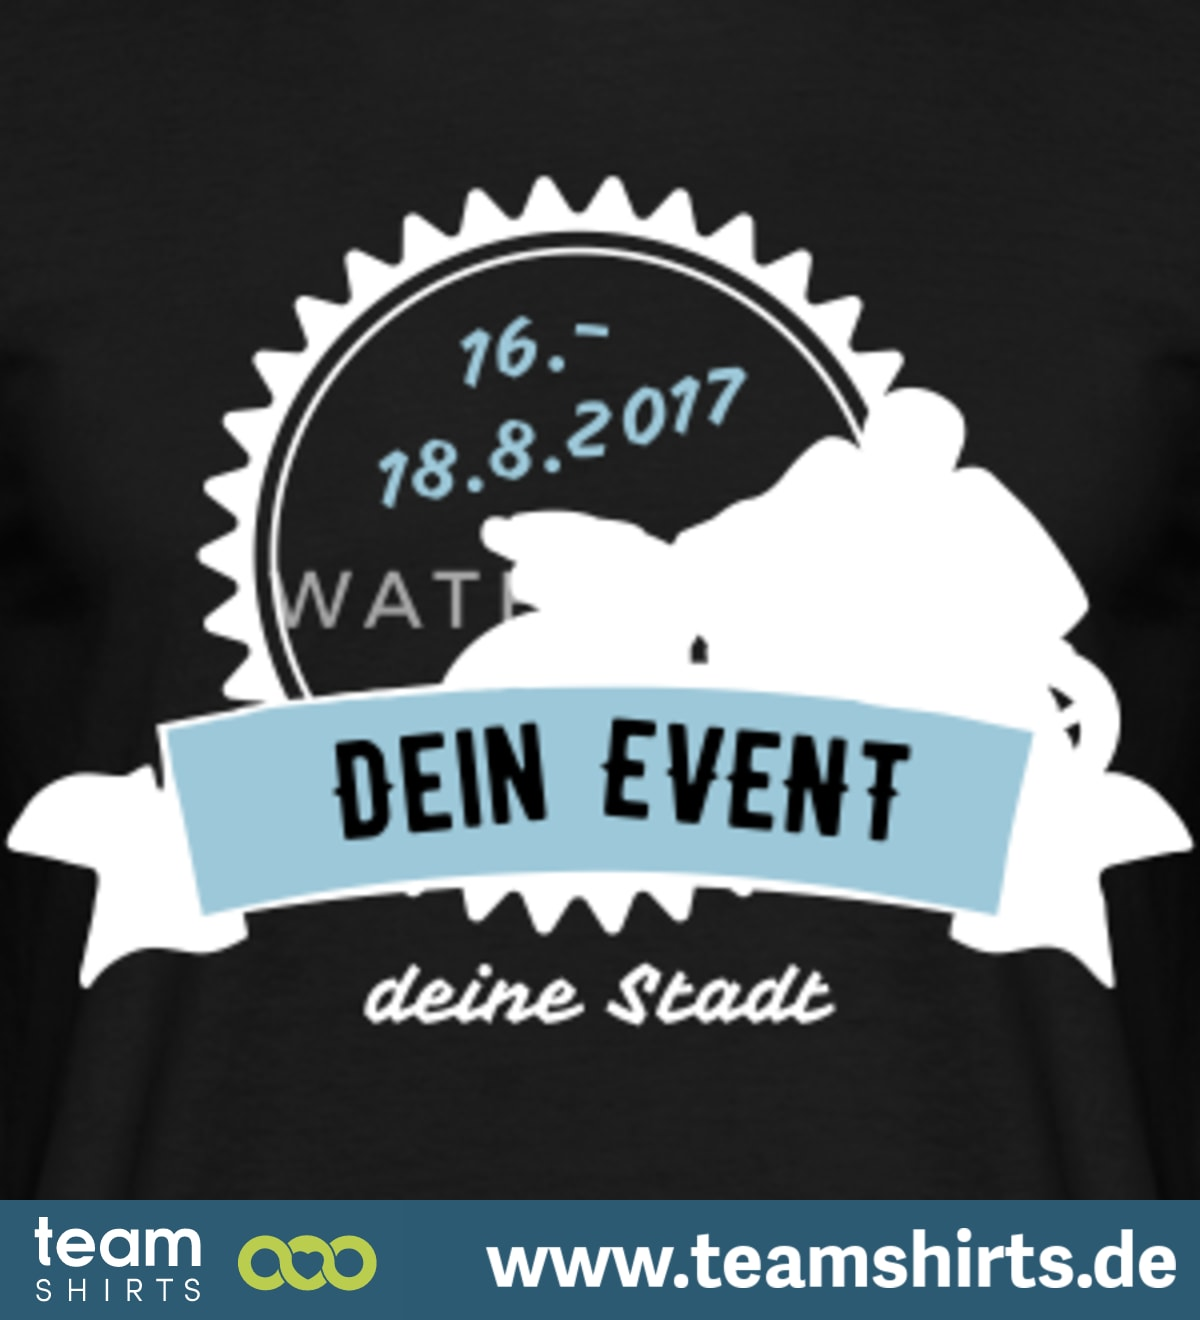 DEIN TUNING EVENT